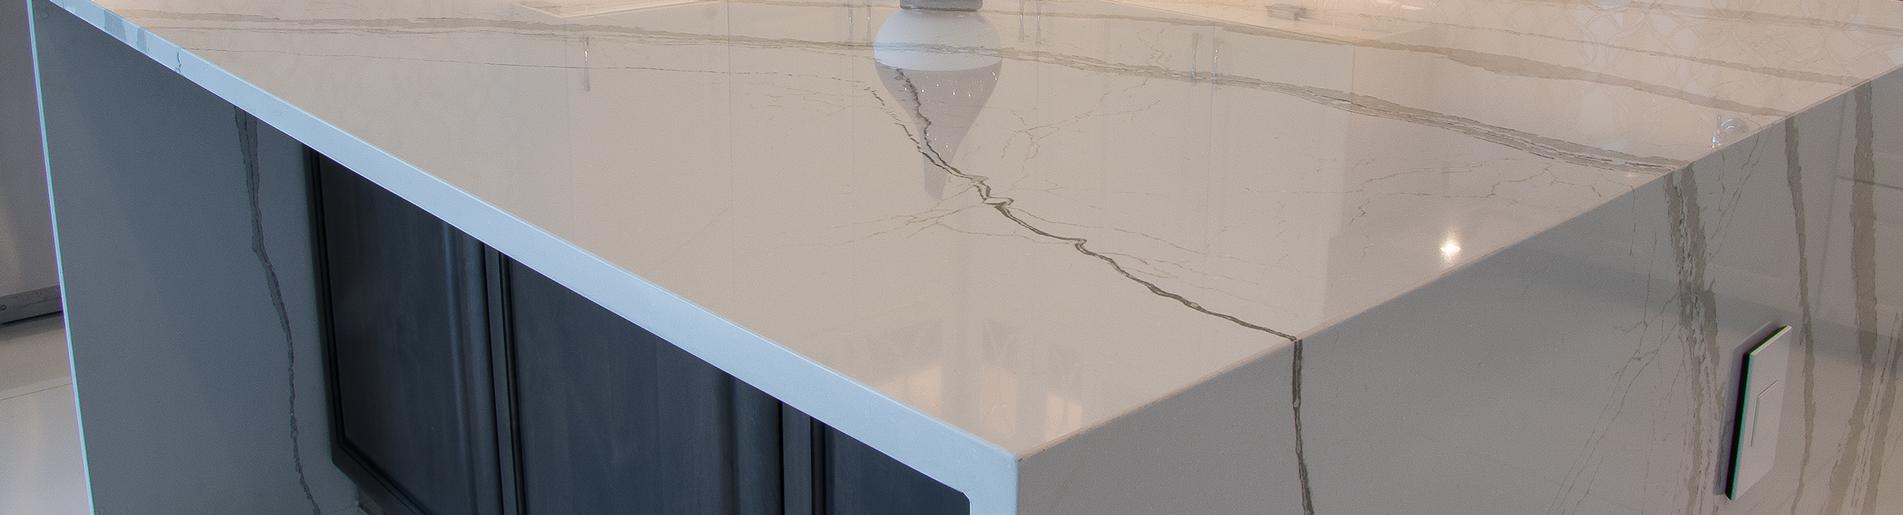 29-sta-granite-bathroom-cambria-c